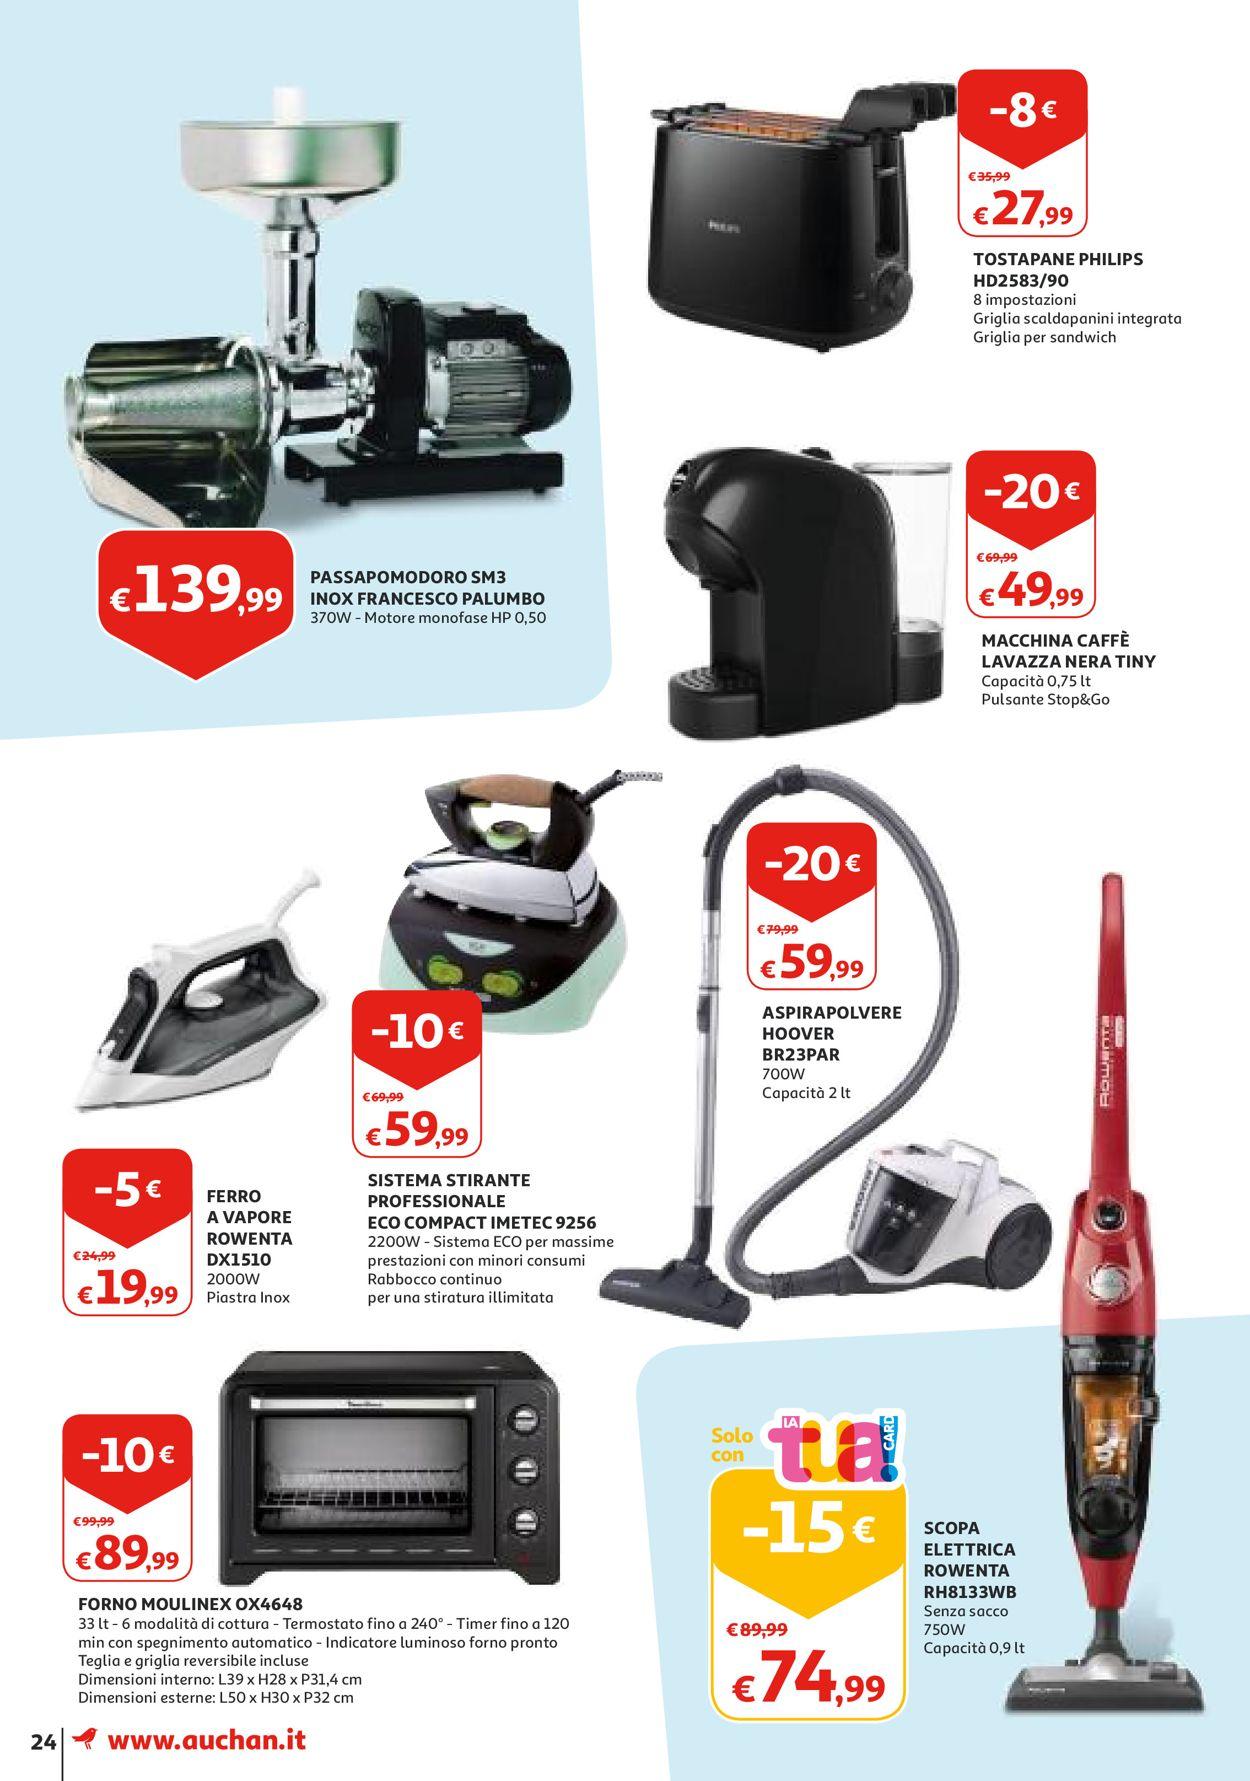 Volantino Auchan - Offerte 20/08-28/08/2019 (Pagina 24)